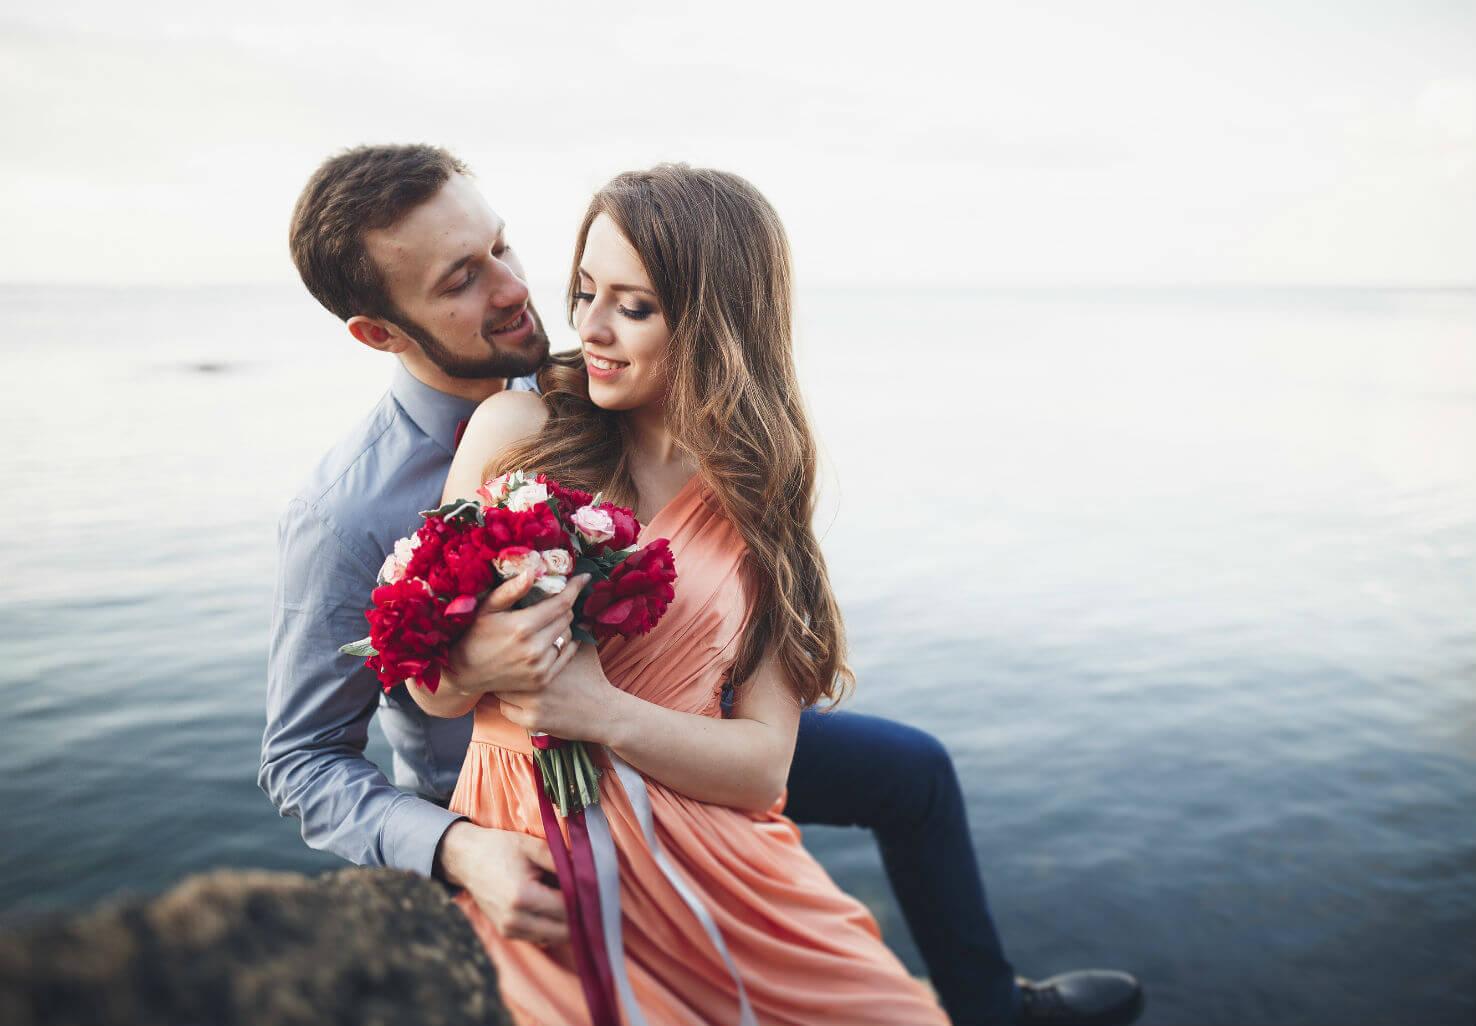 Couple enjoying bouquet by lake